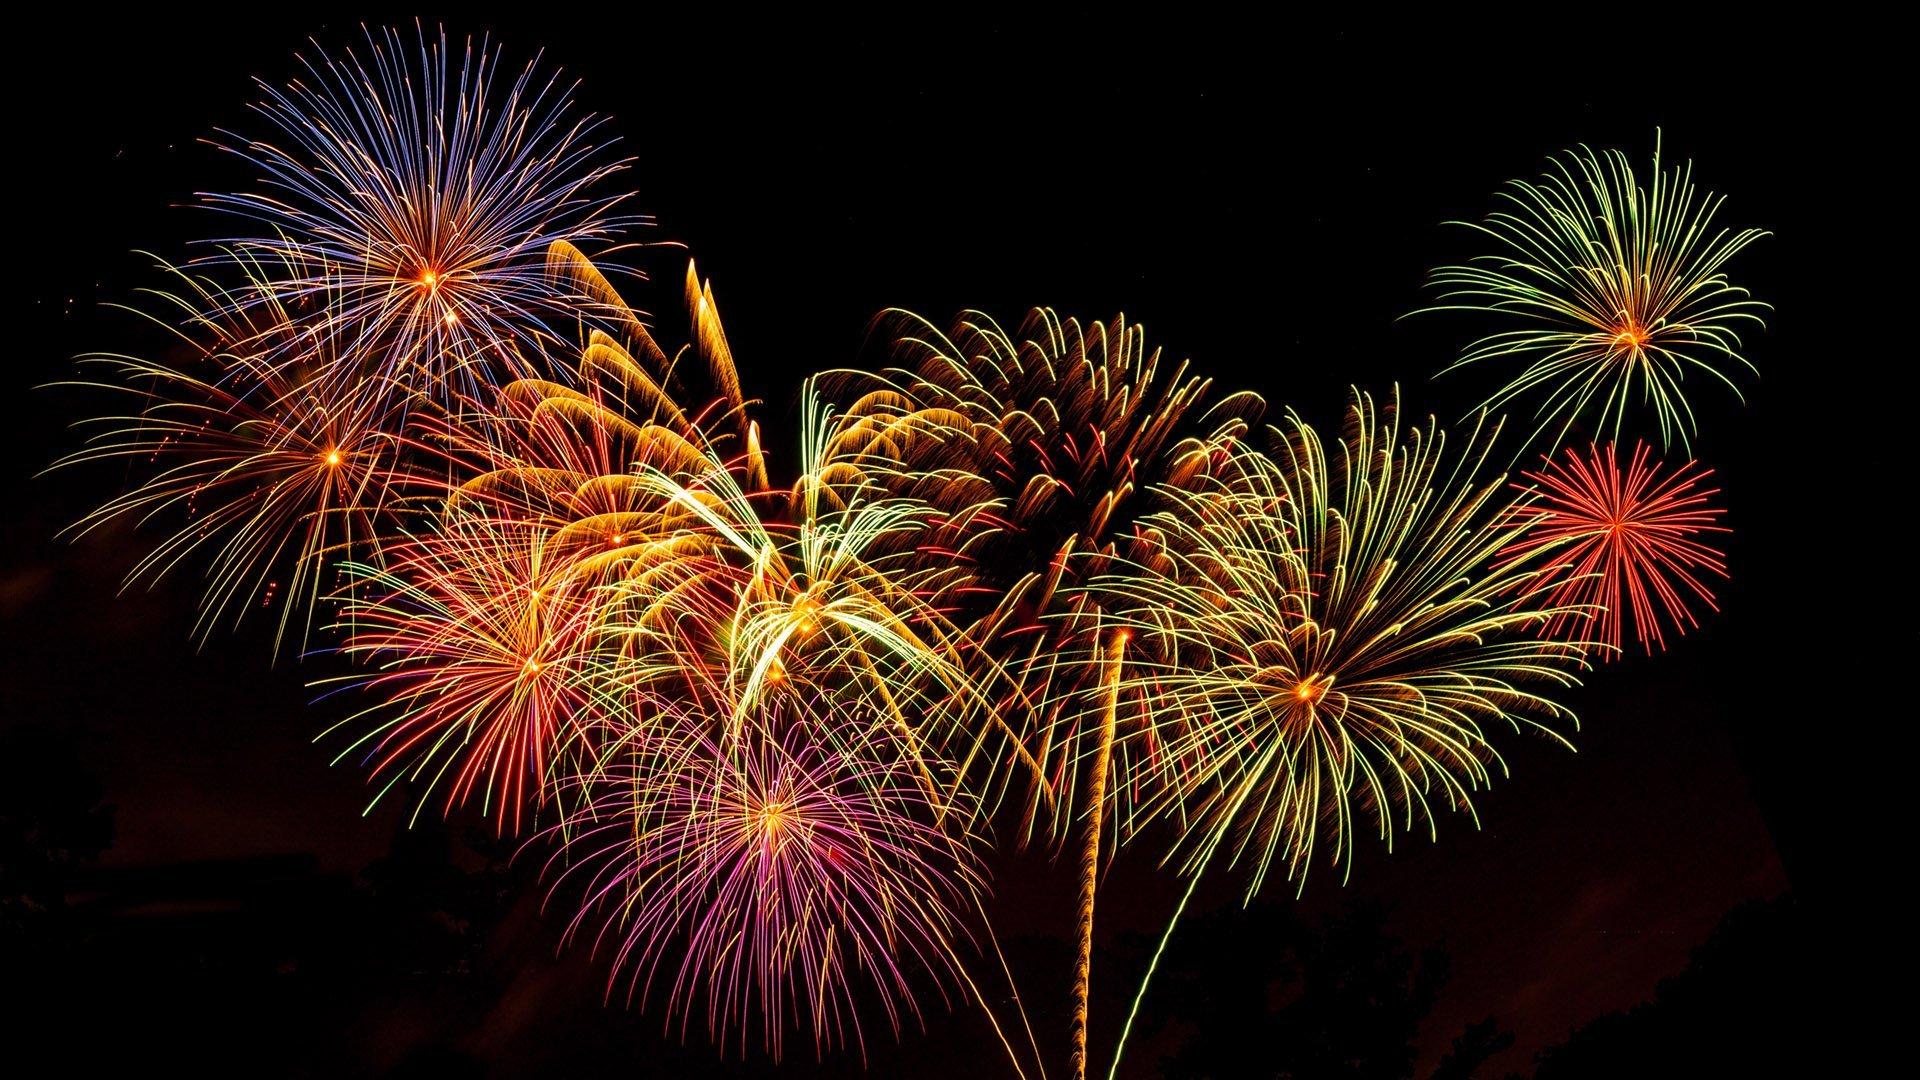 Light up the night sky: Firework photography